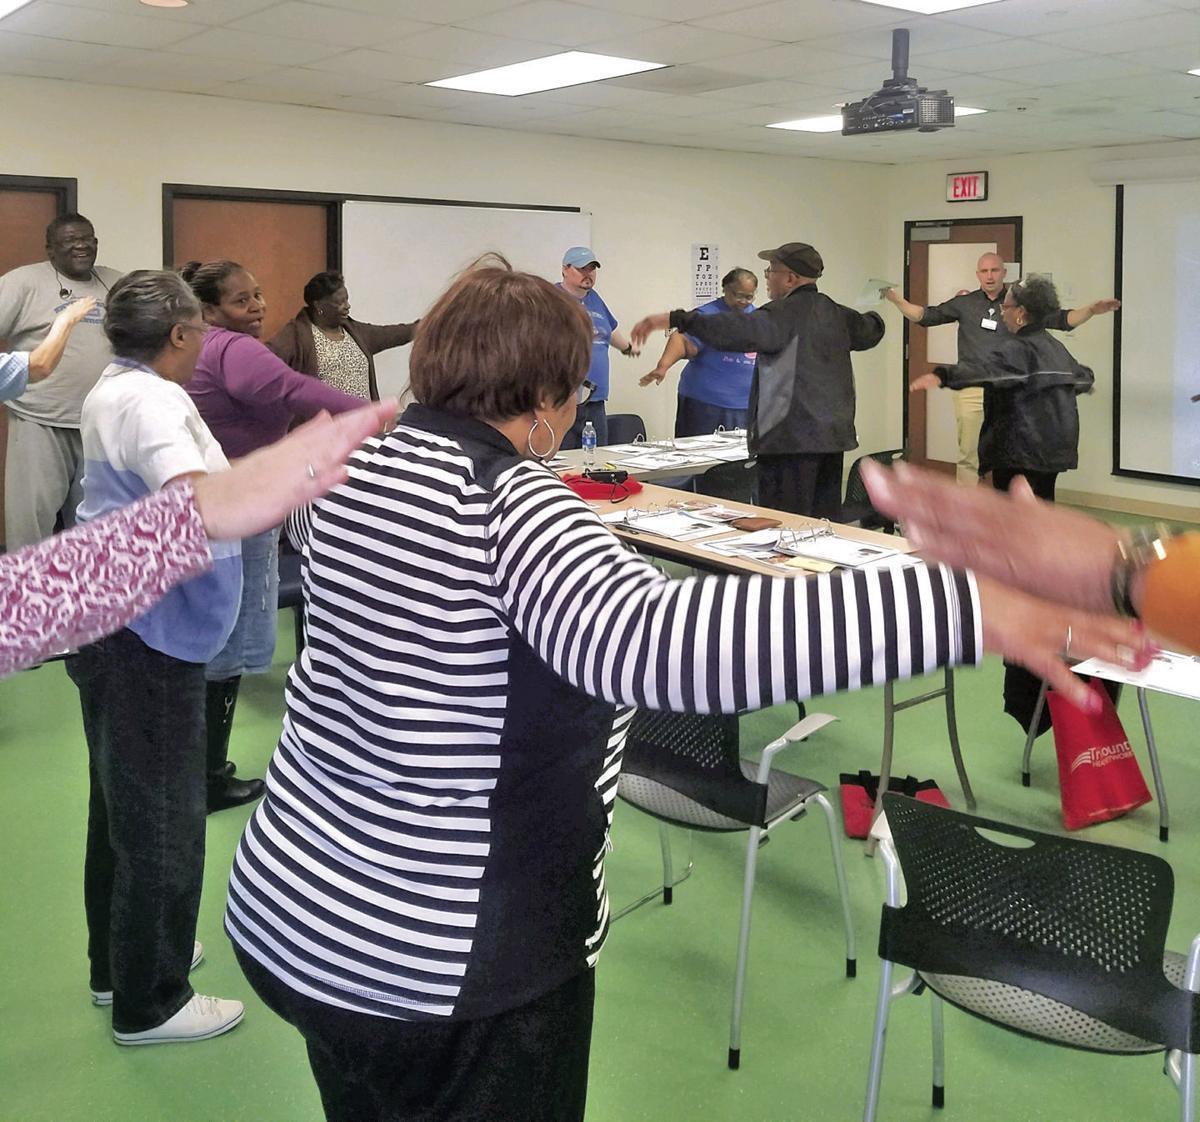 RMC HealthPlex Diabetes Prevention Program